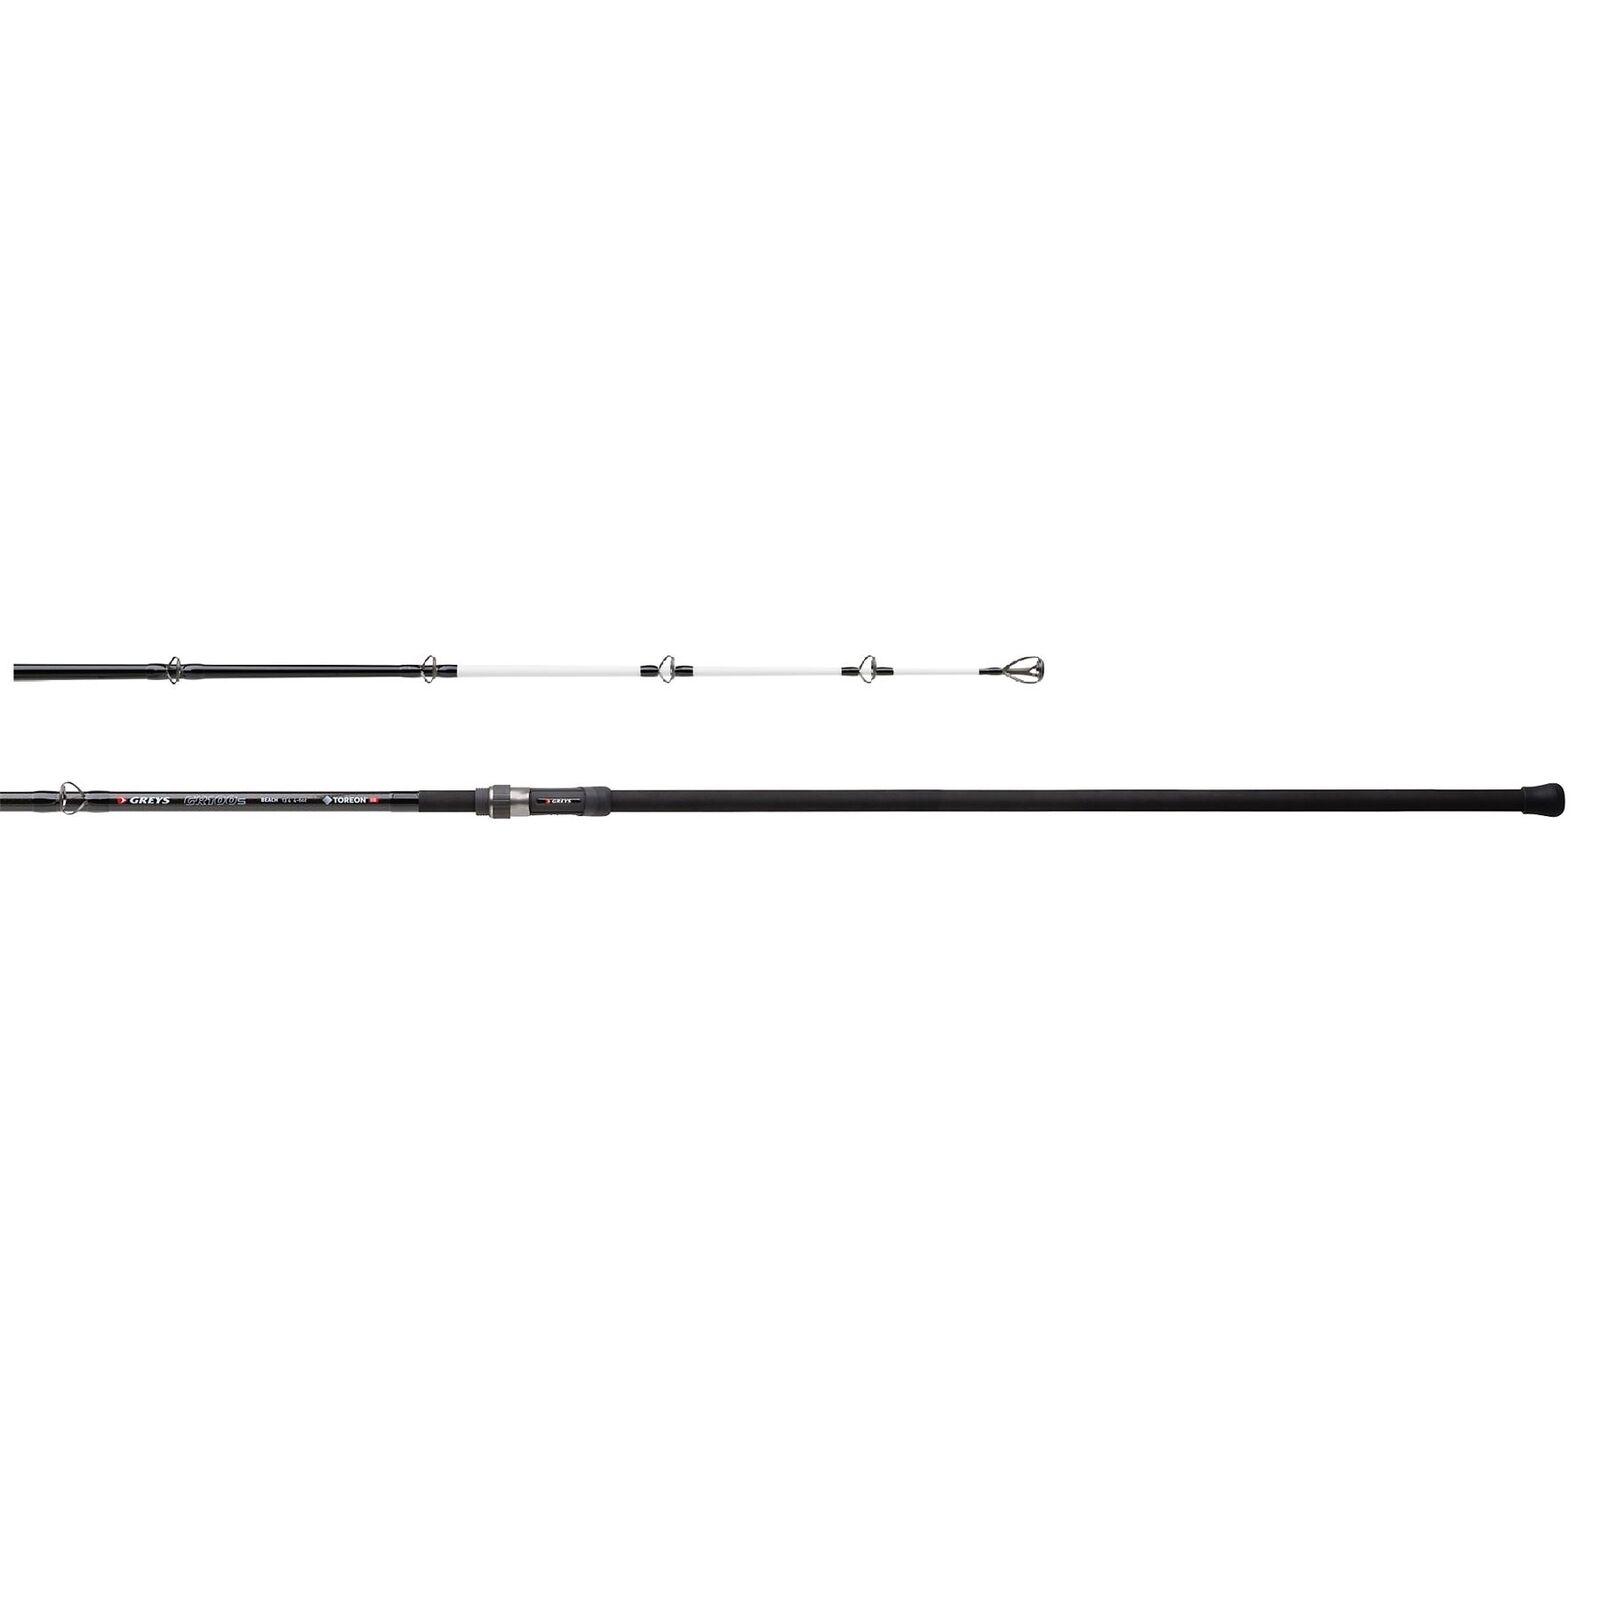 "1374080 Greys GR100S 13ft 9/"" 5-7oz Shore Beach Fishing Rod"